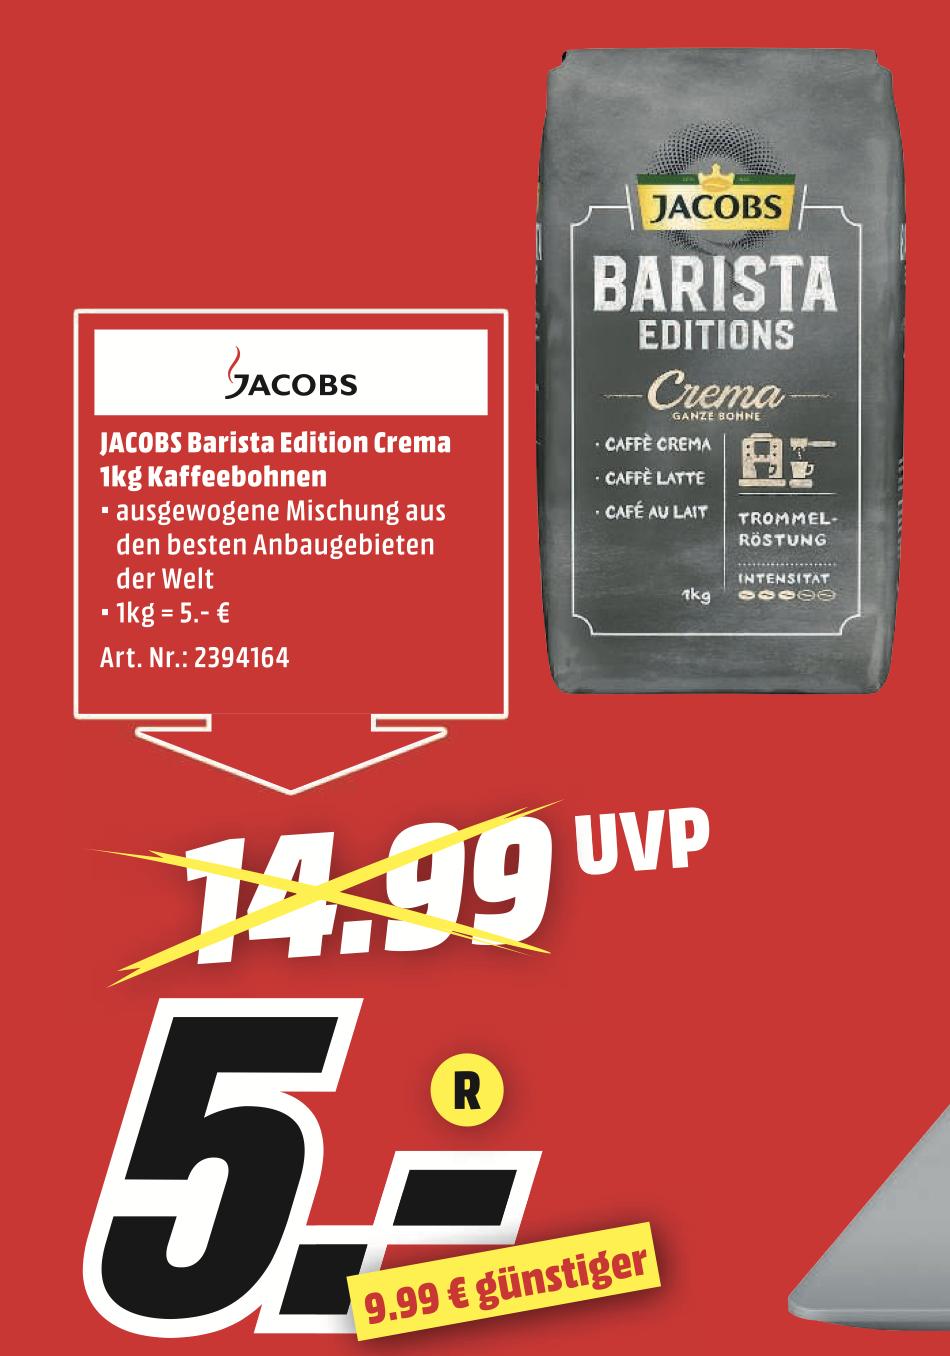 Jacobs Barista Editions Crema 1KG (ganze Bohne) [Lokal MediaMarkt Karlsruhe]